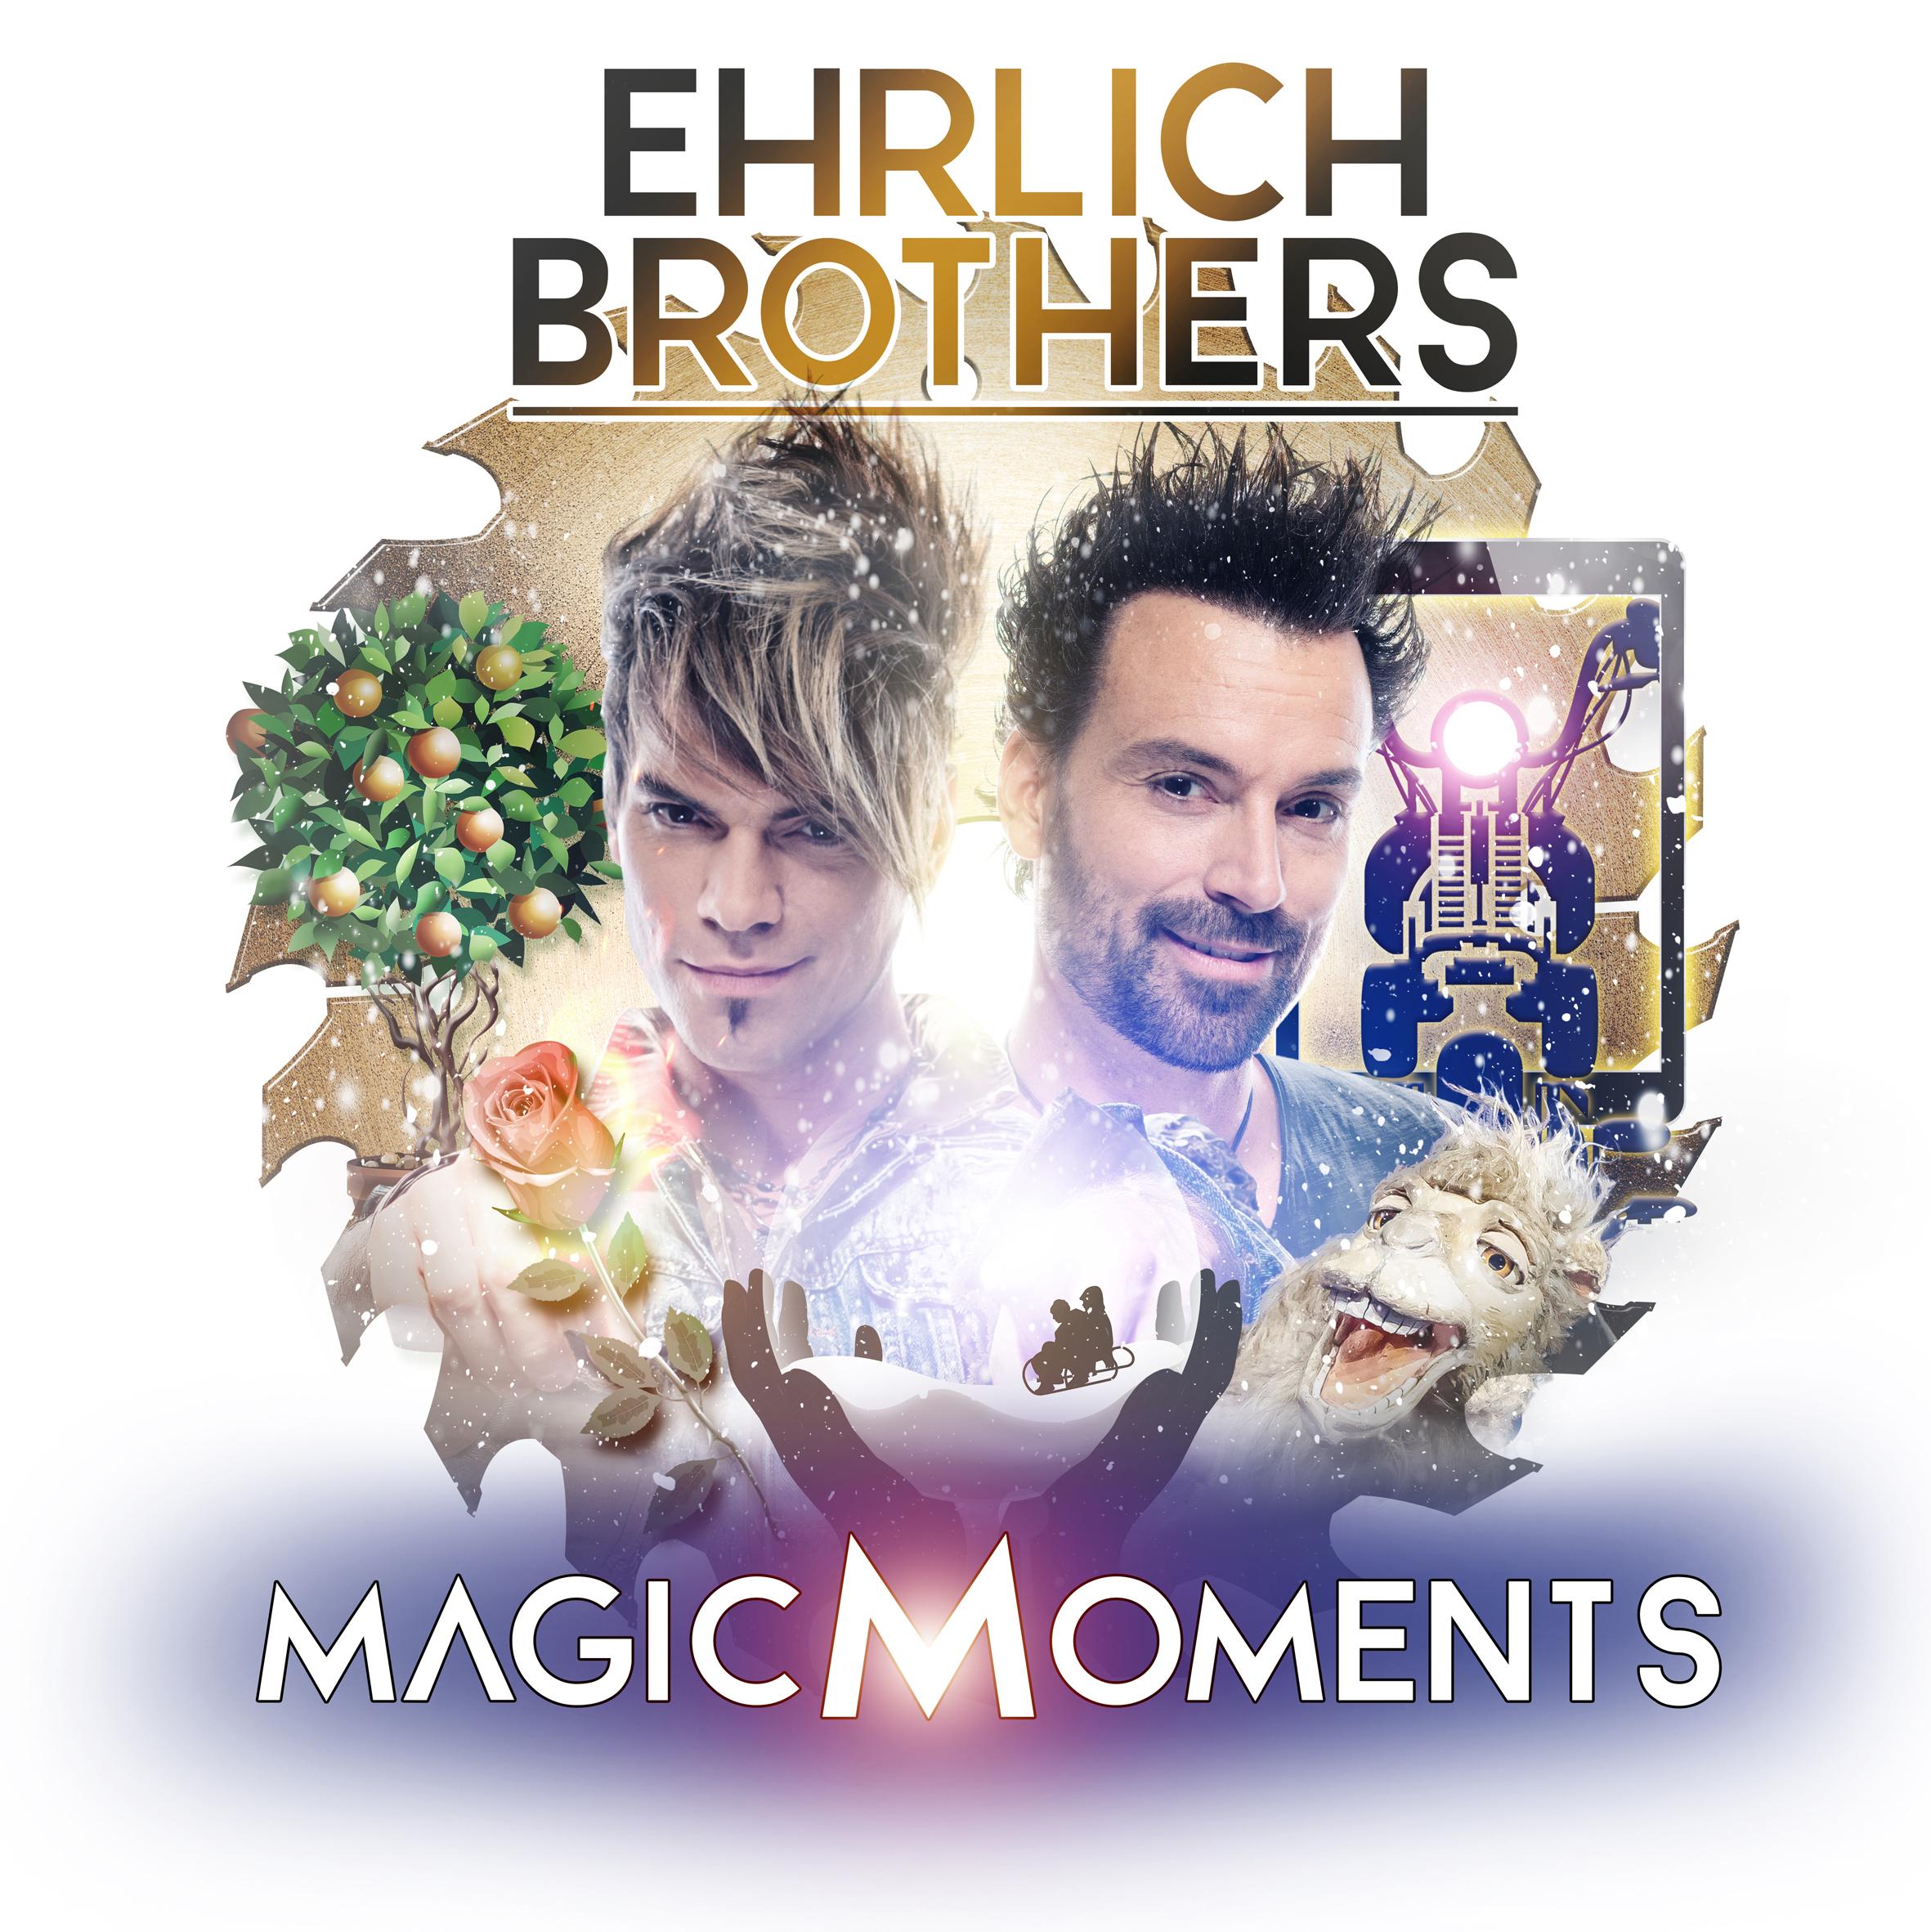 https://www.ccsaar.de/wp-content/uploads/2021/05/EhrlichBrothers-MagicMoments-CI-quadrat_cSebastianKonopix.jpg